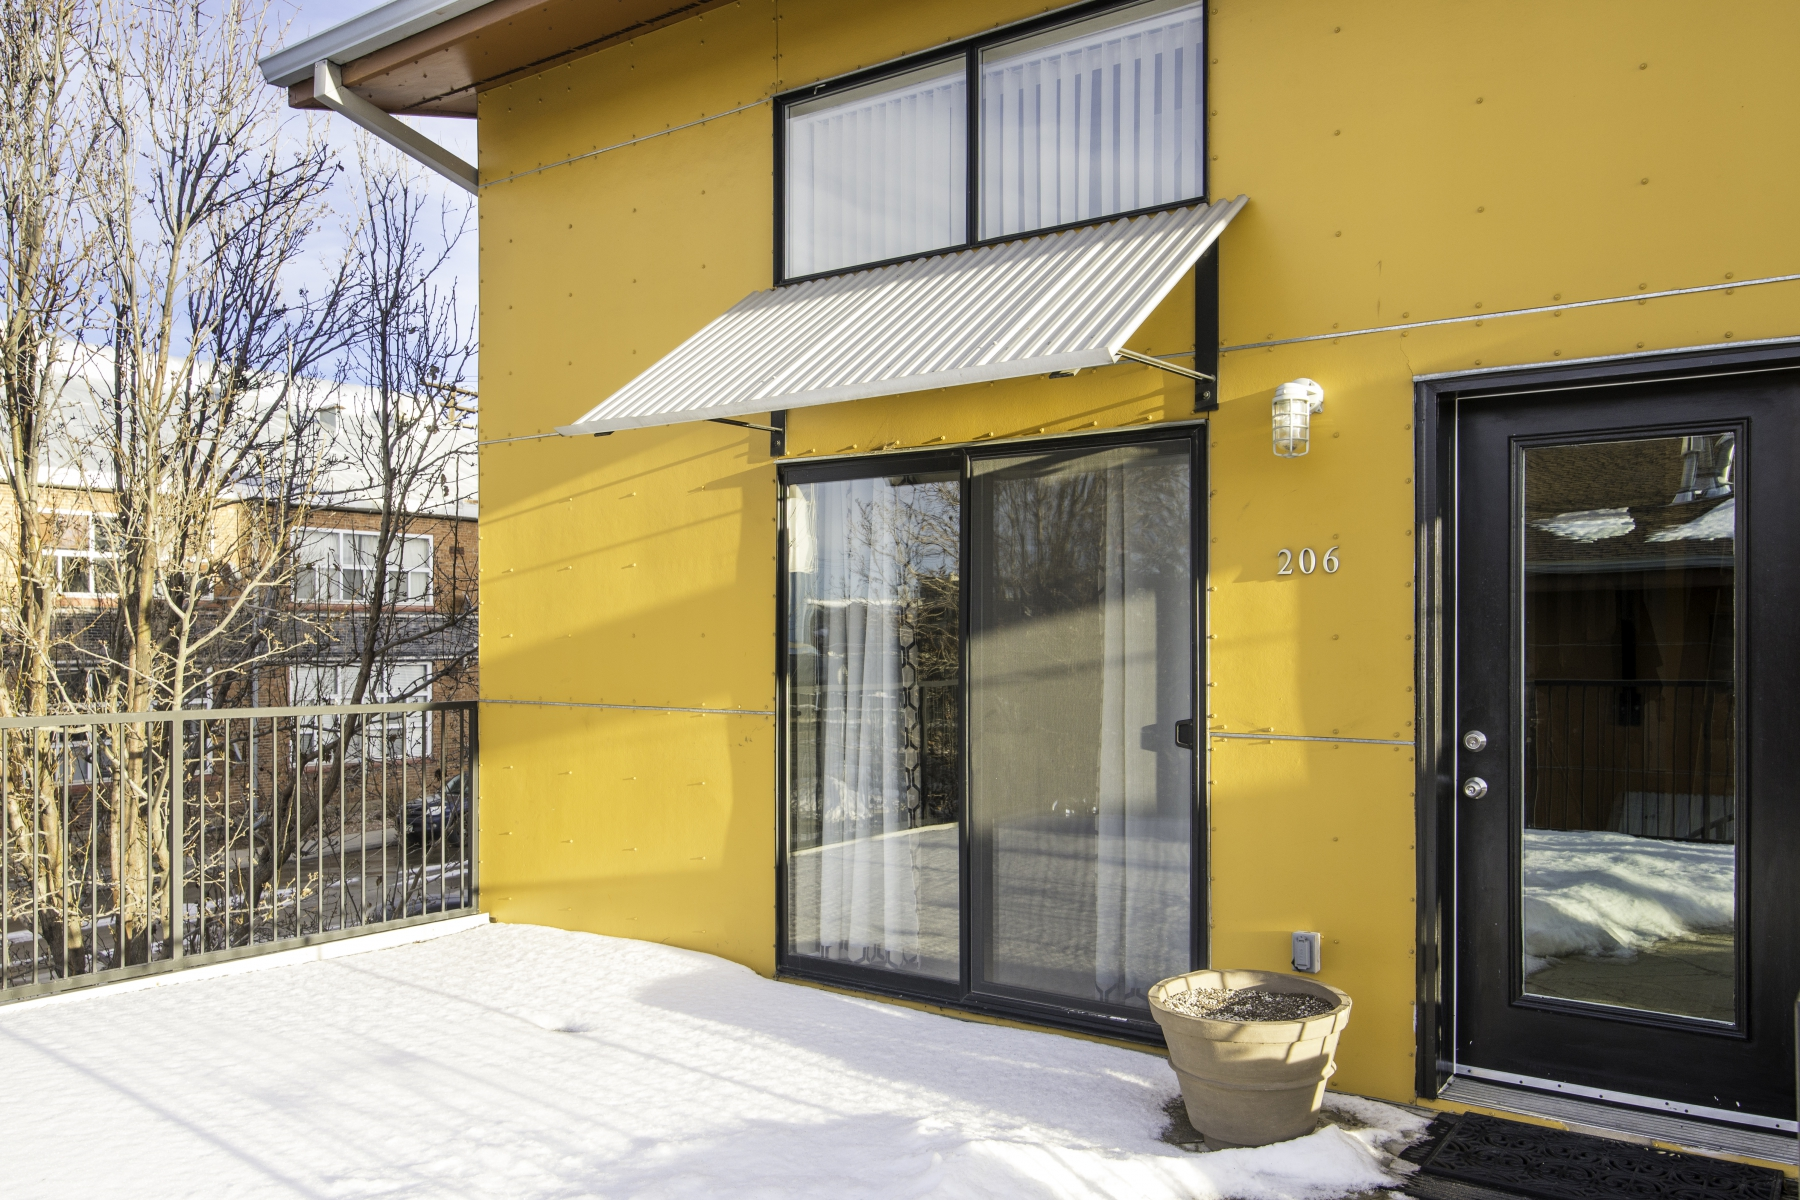 Condominium for Sale at Very Cool Two-Story Corner Unit Loft 3295 Blake Street #206 Denver, Colorado 80205 United States